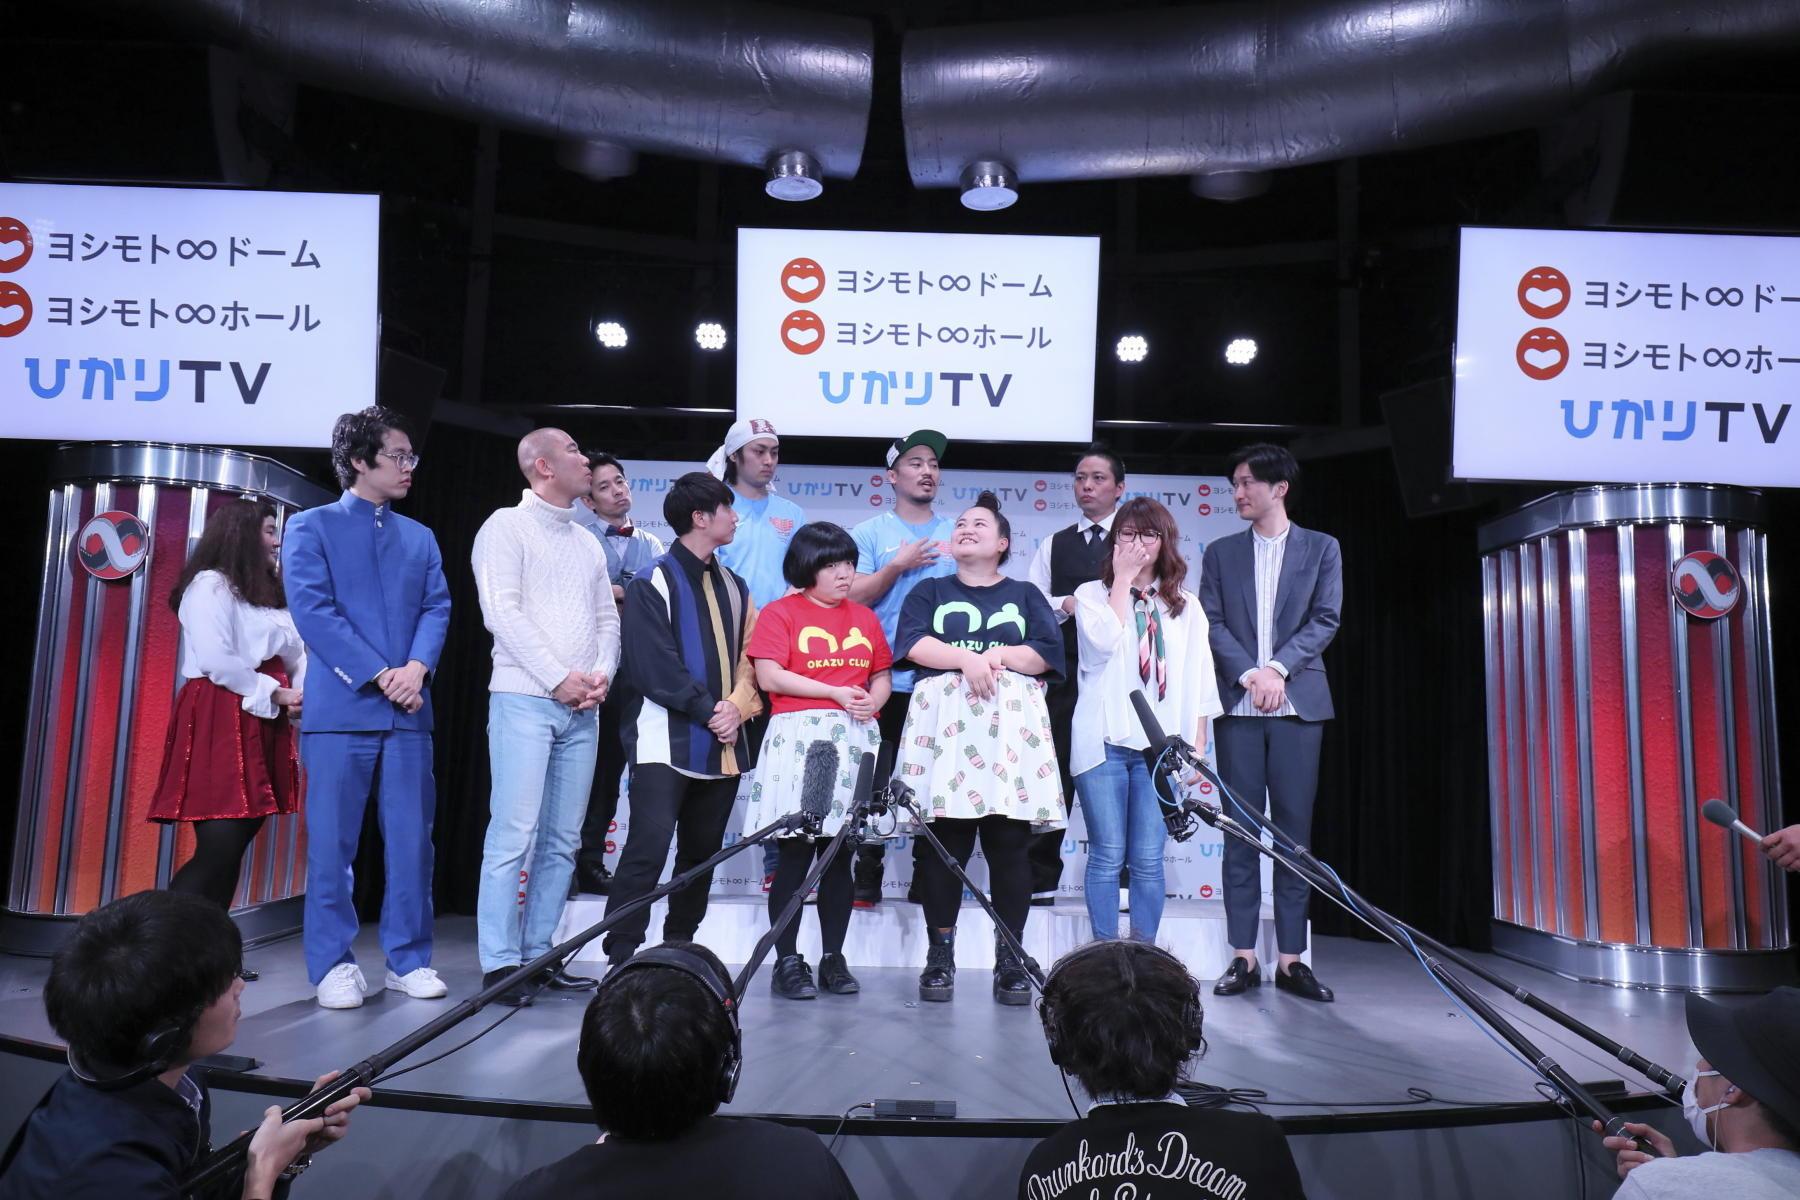 http://news.yoshimoto.co.jp/20181110145446-7d367b3cf13864986d0297f8cf0e2661e3071cd9.jpg